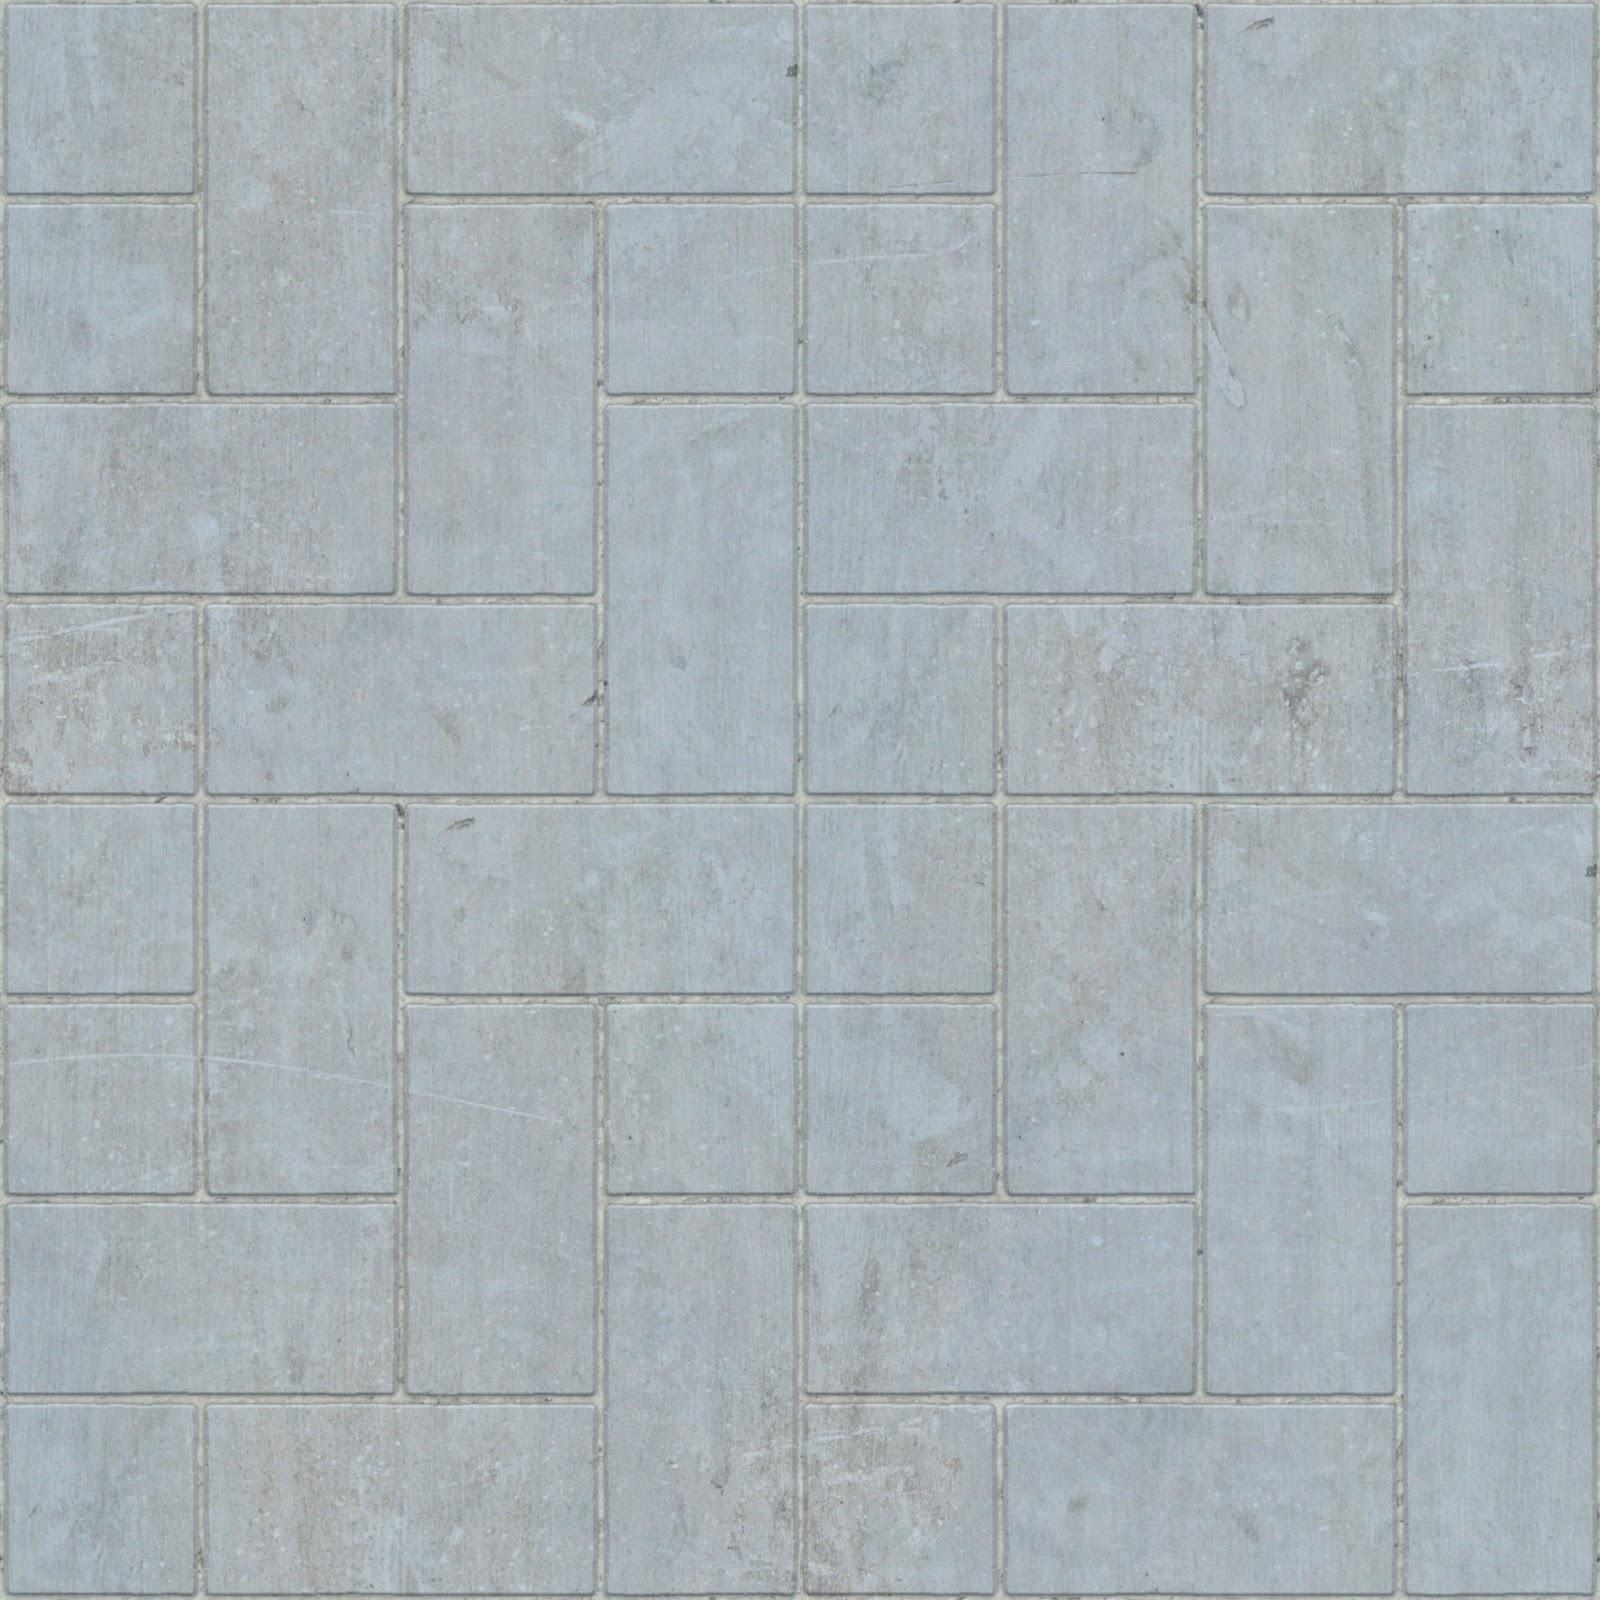 Free photo: Tiled concrete texture - stone, rough, surface ...